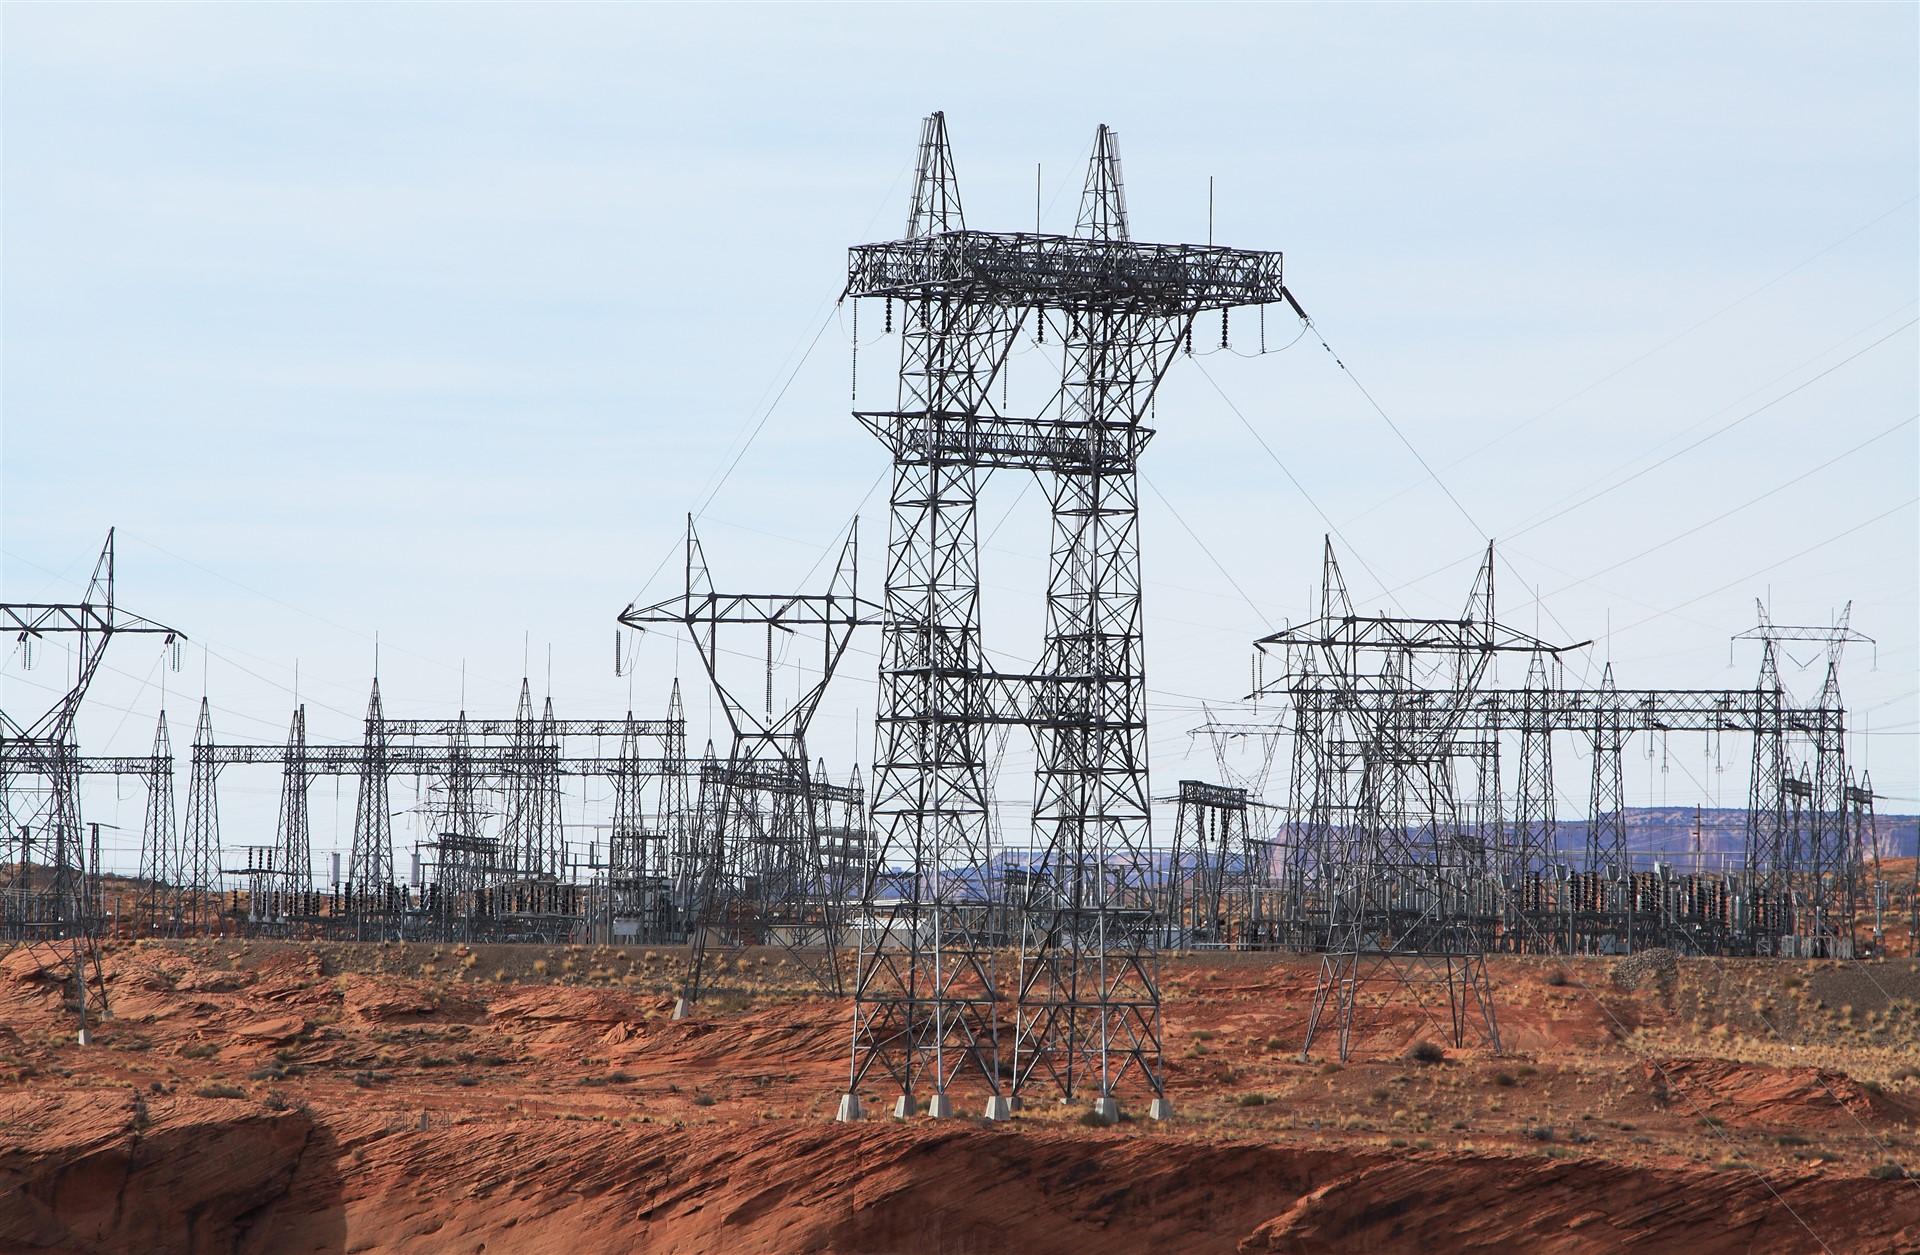 Agencia aduanal industria energética